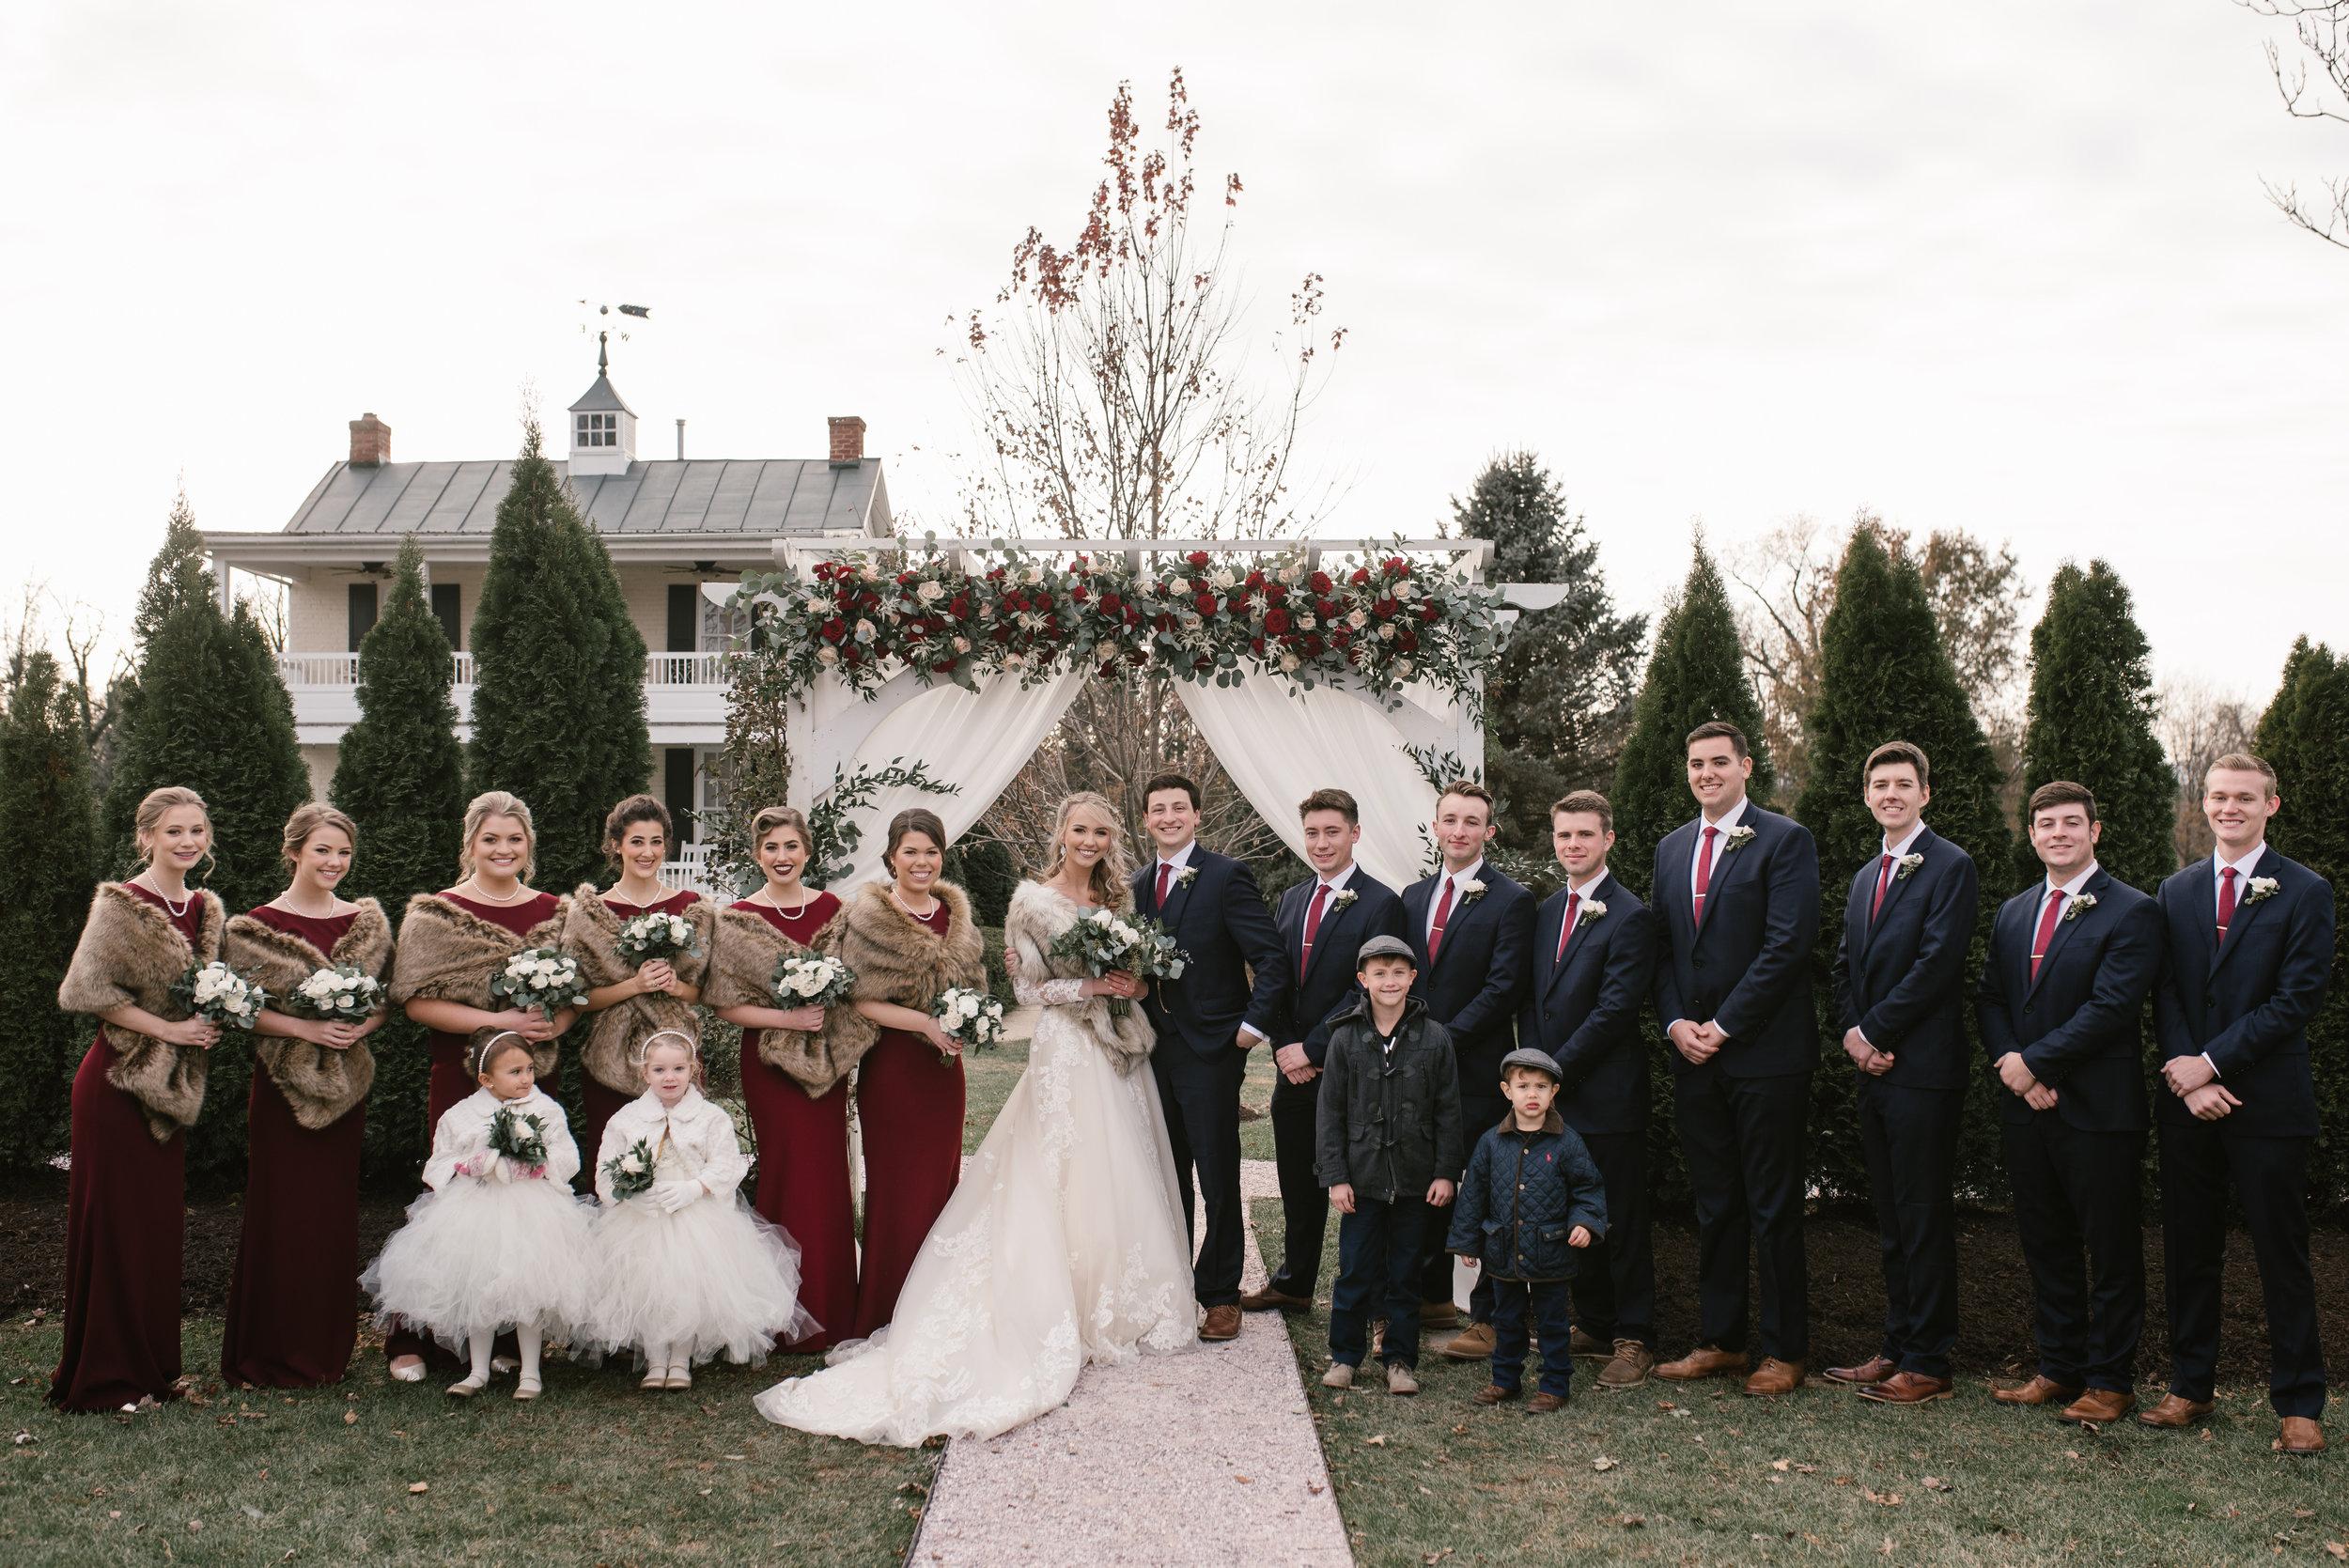 antrim-18444-spencer-wedding-1024.jpg